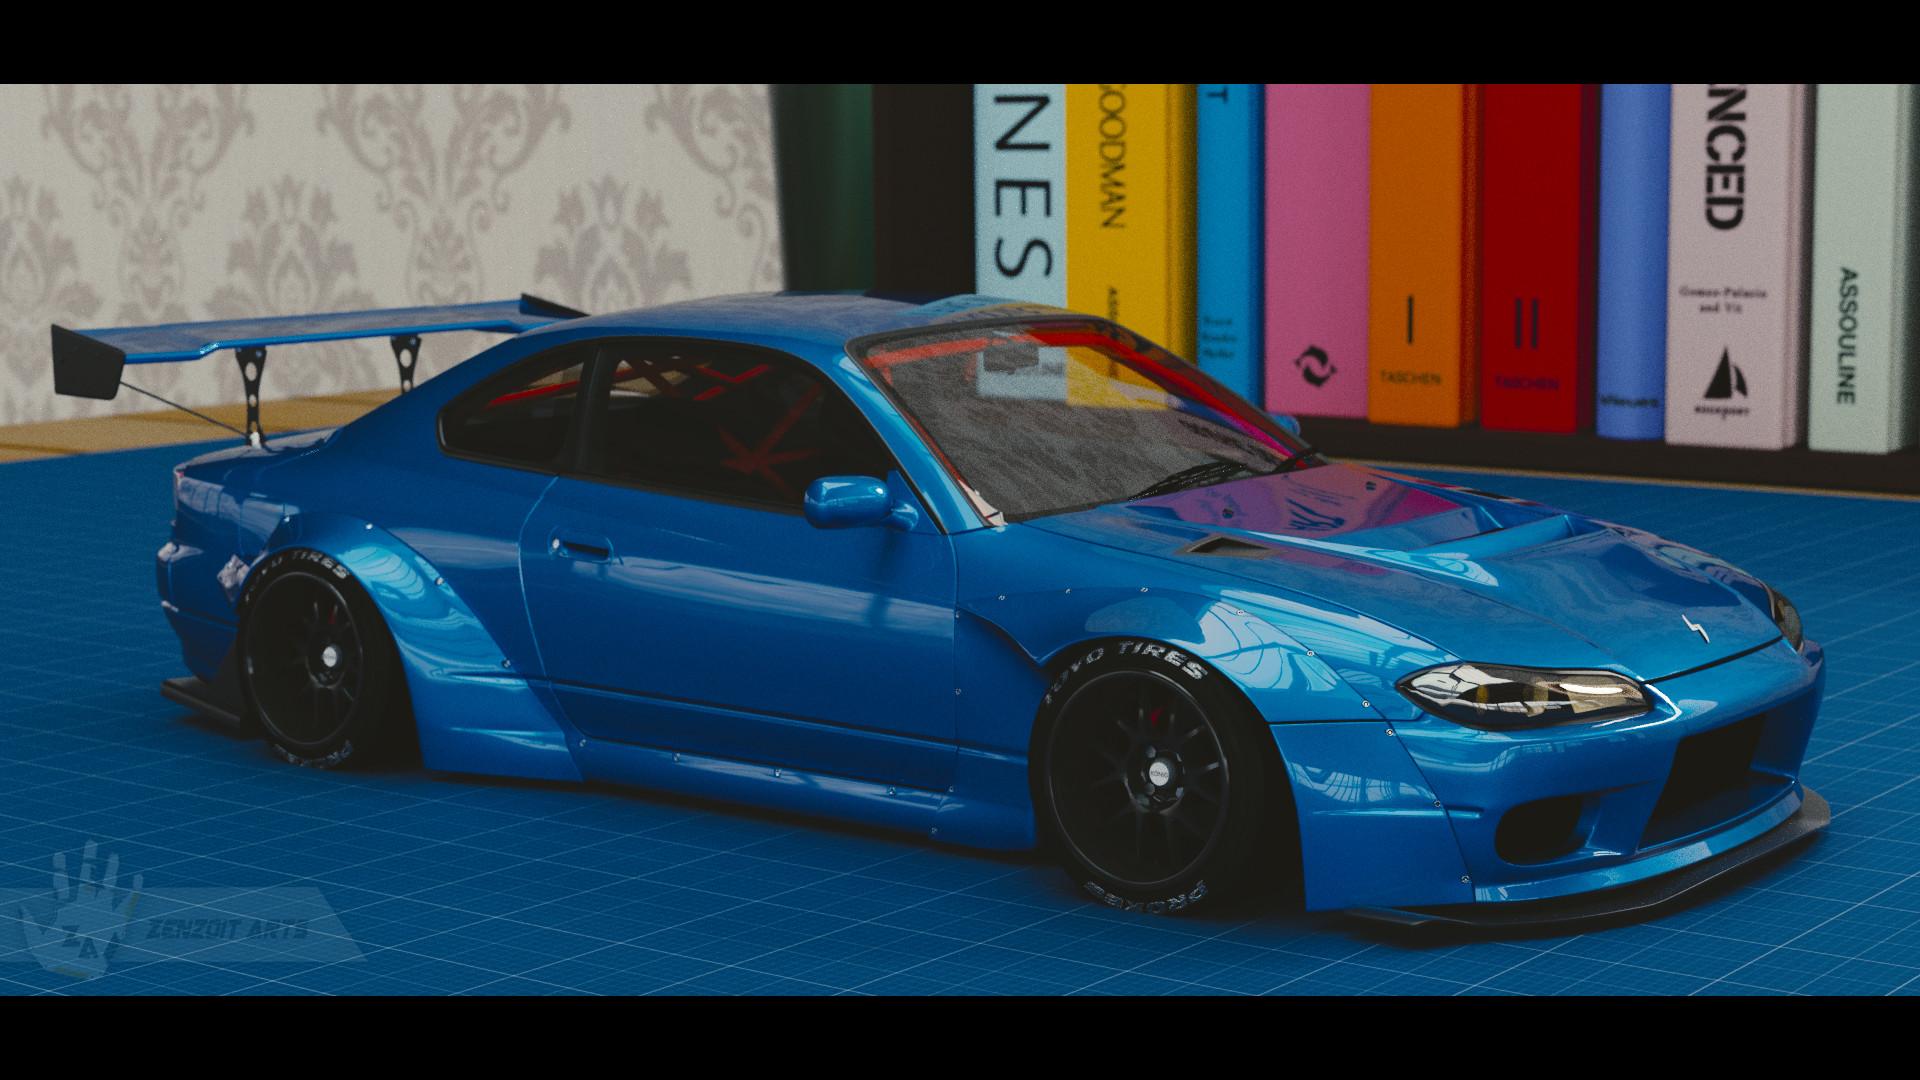 ArtStation - Nissan Silvia S15 Custom Rocket Bunny, Zenzoit Arts